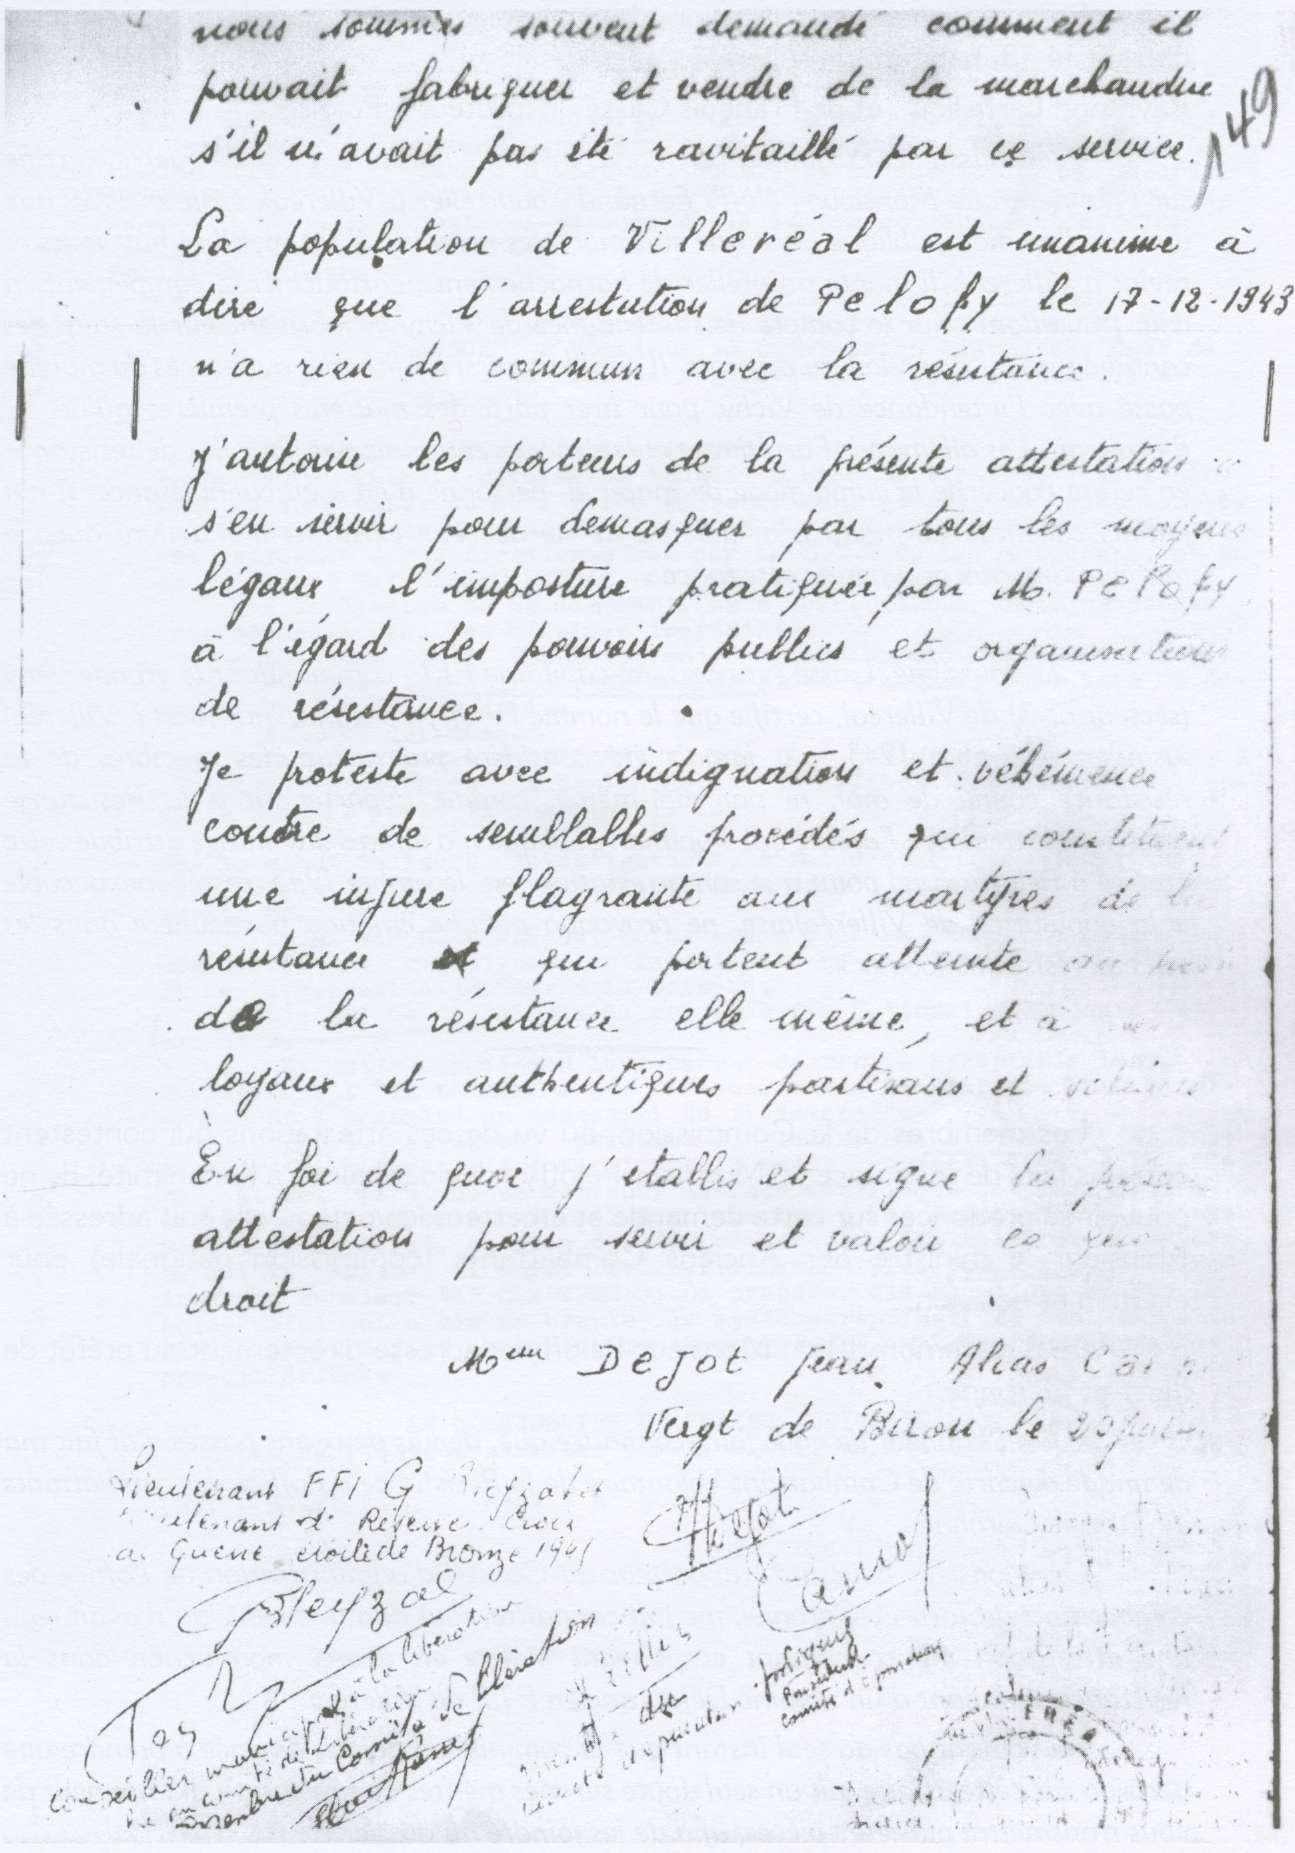 Tome3-Memoire-heurs-et-malheursPage227